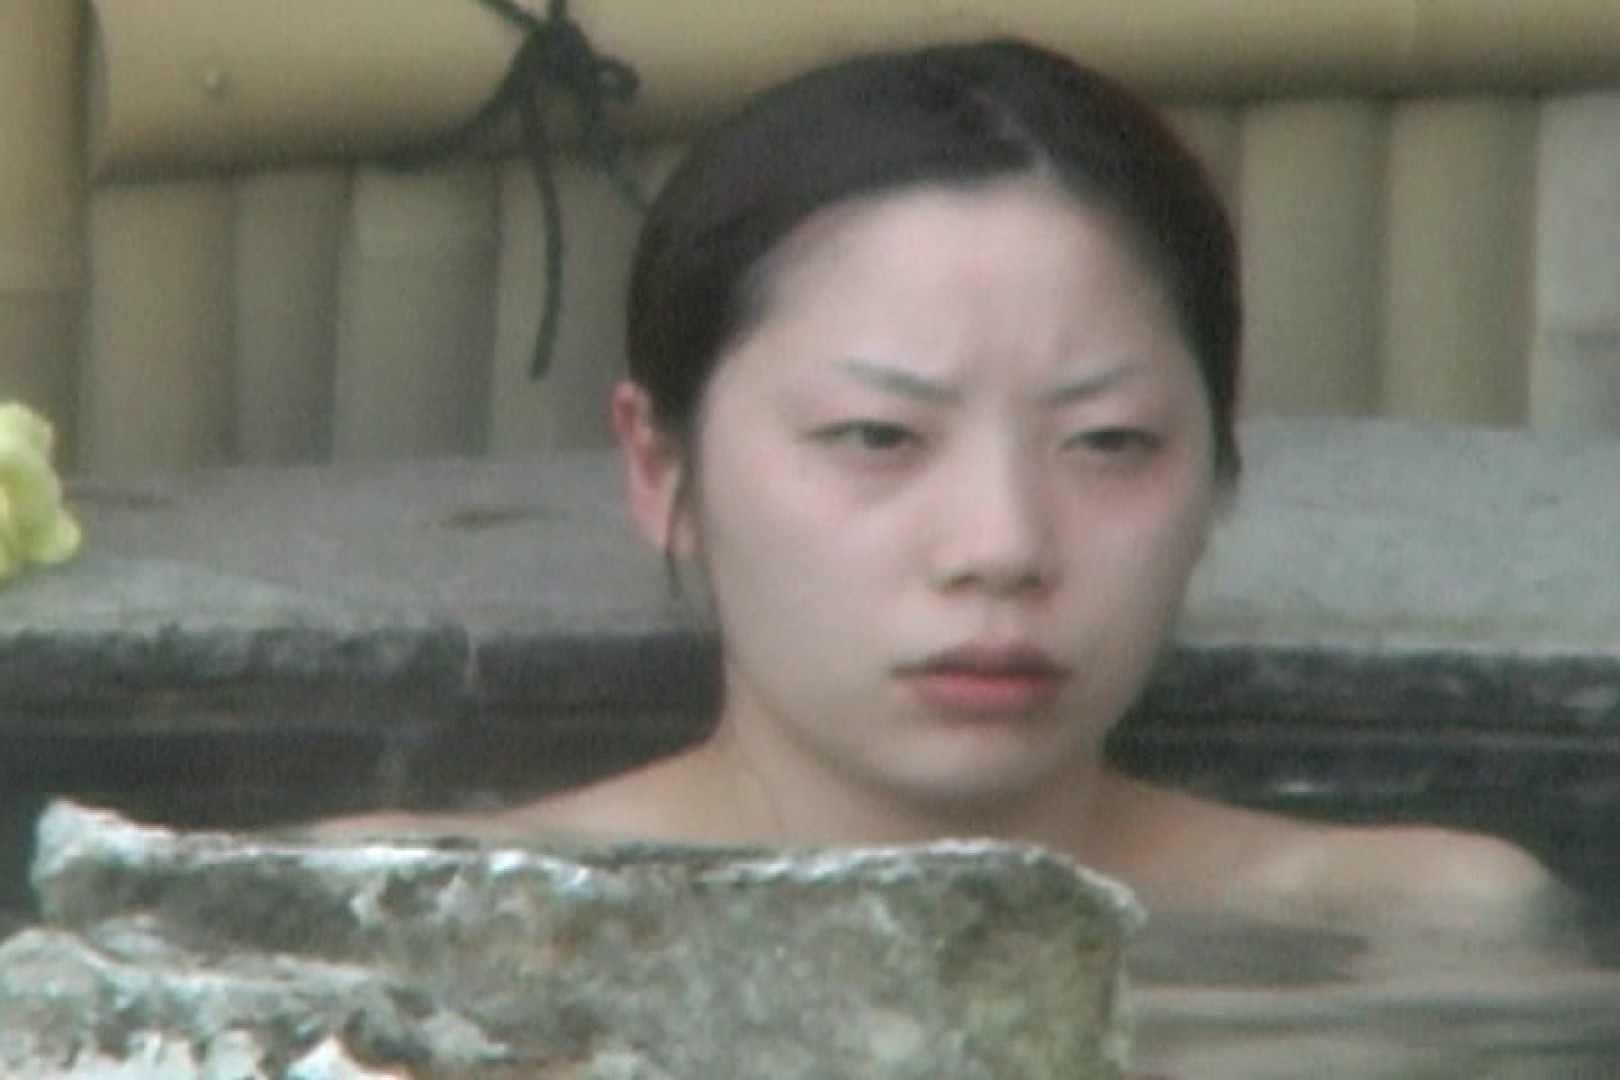 Aquaな露天風呂Vol.596 OLセックス | 盗撮  77画像 7